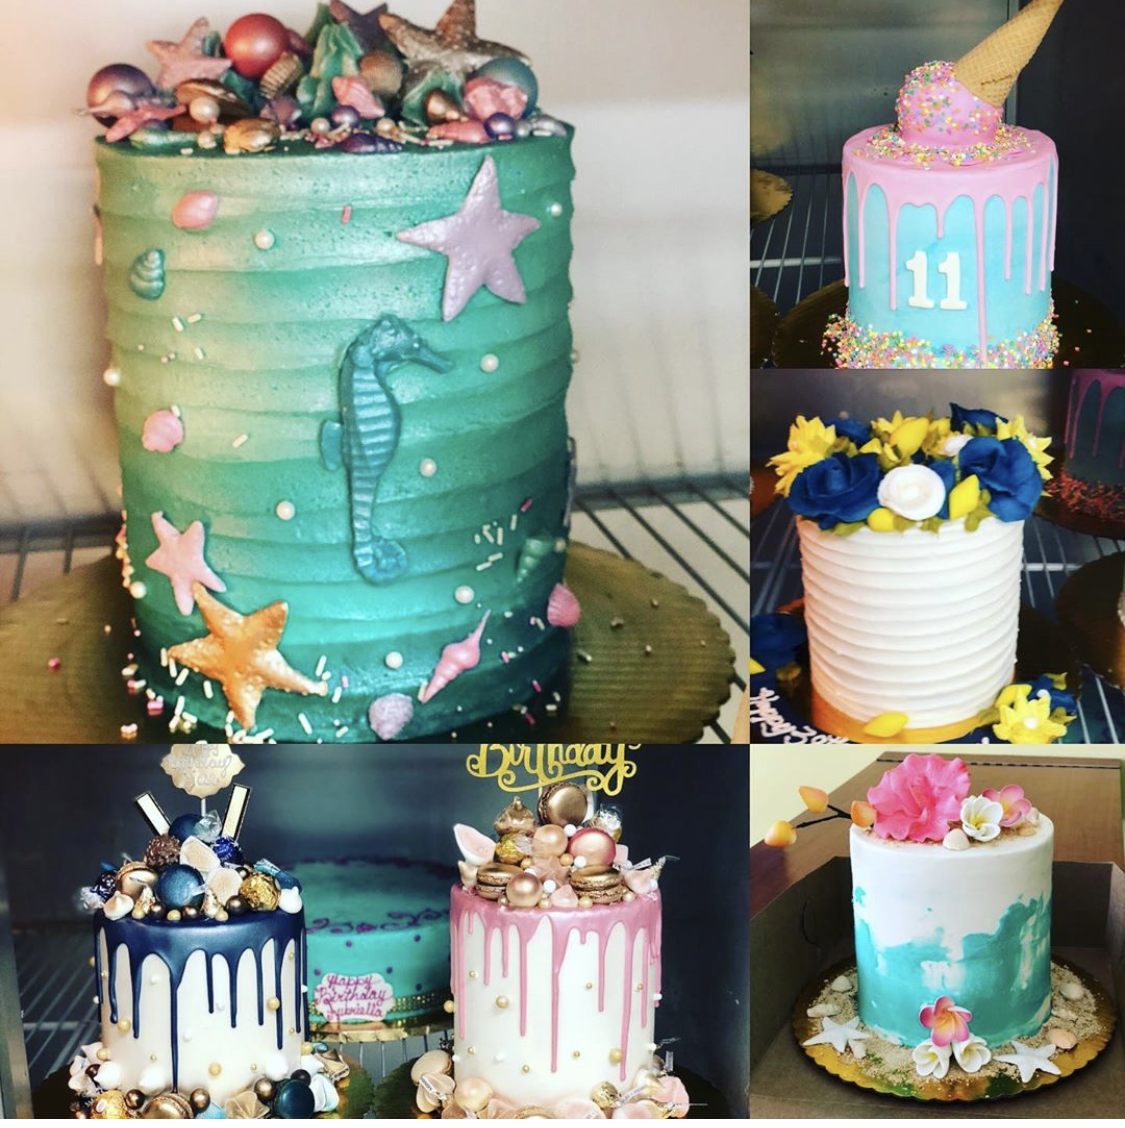 Madelyns Miami, Florida amazing special occasion birthday cake